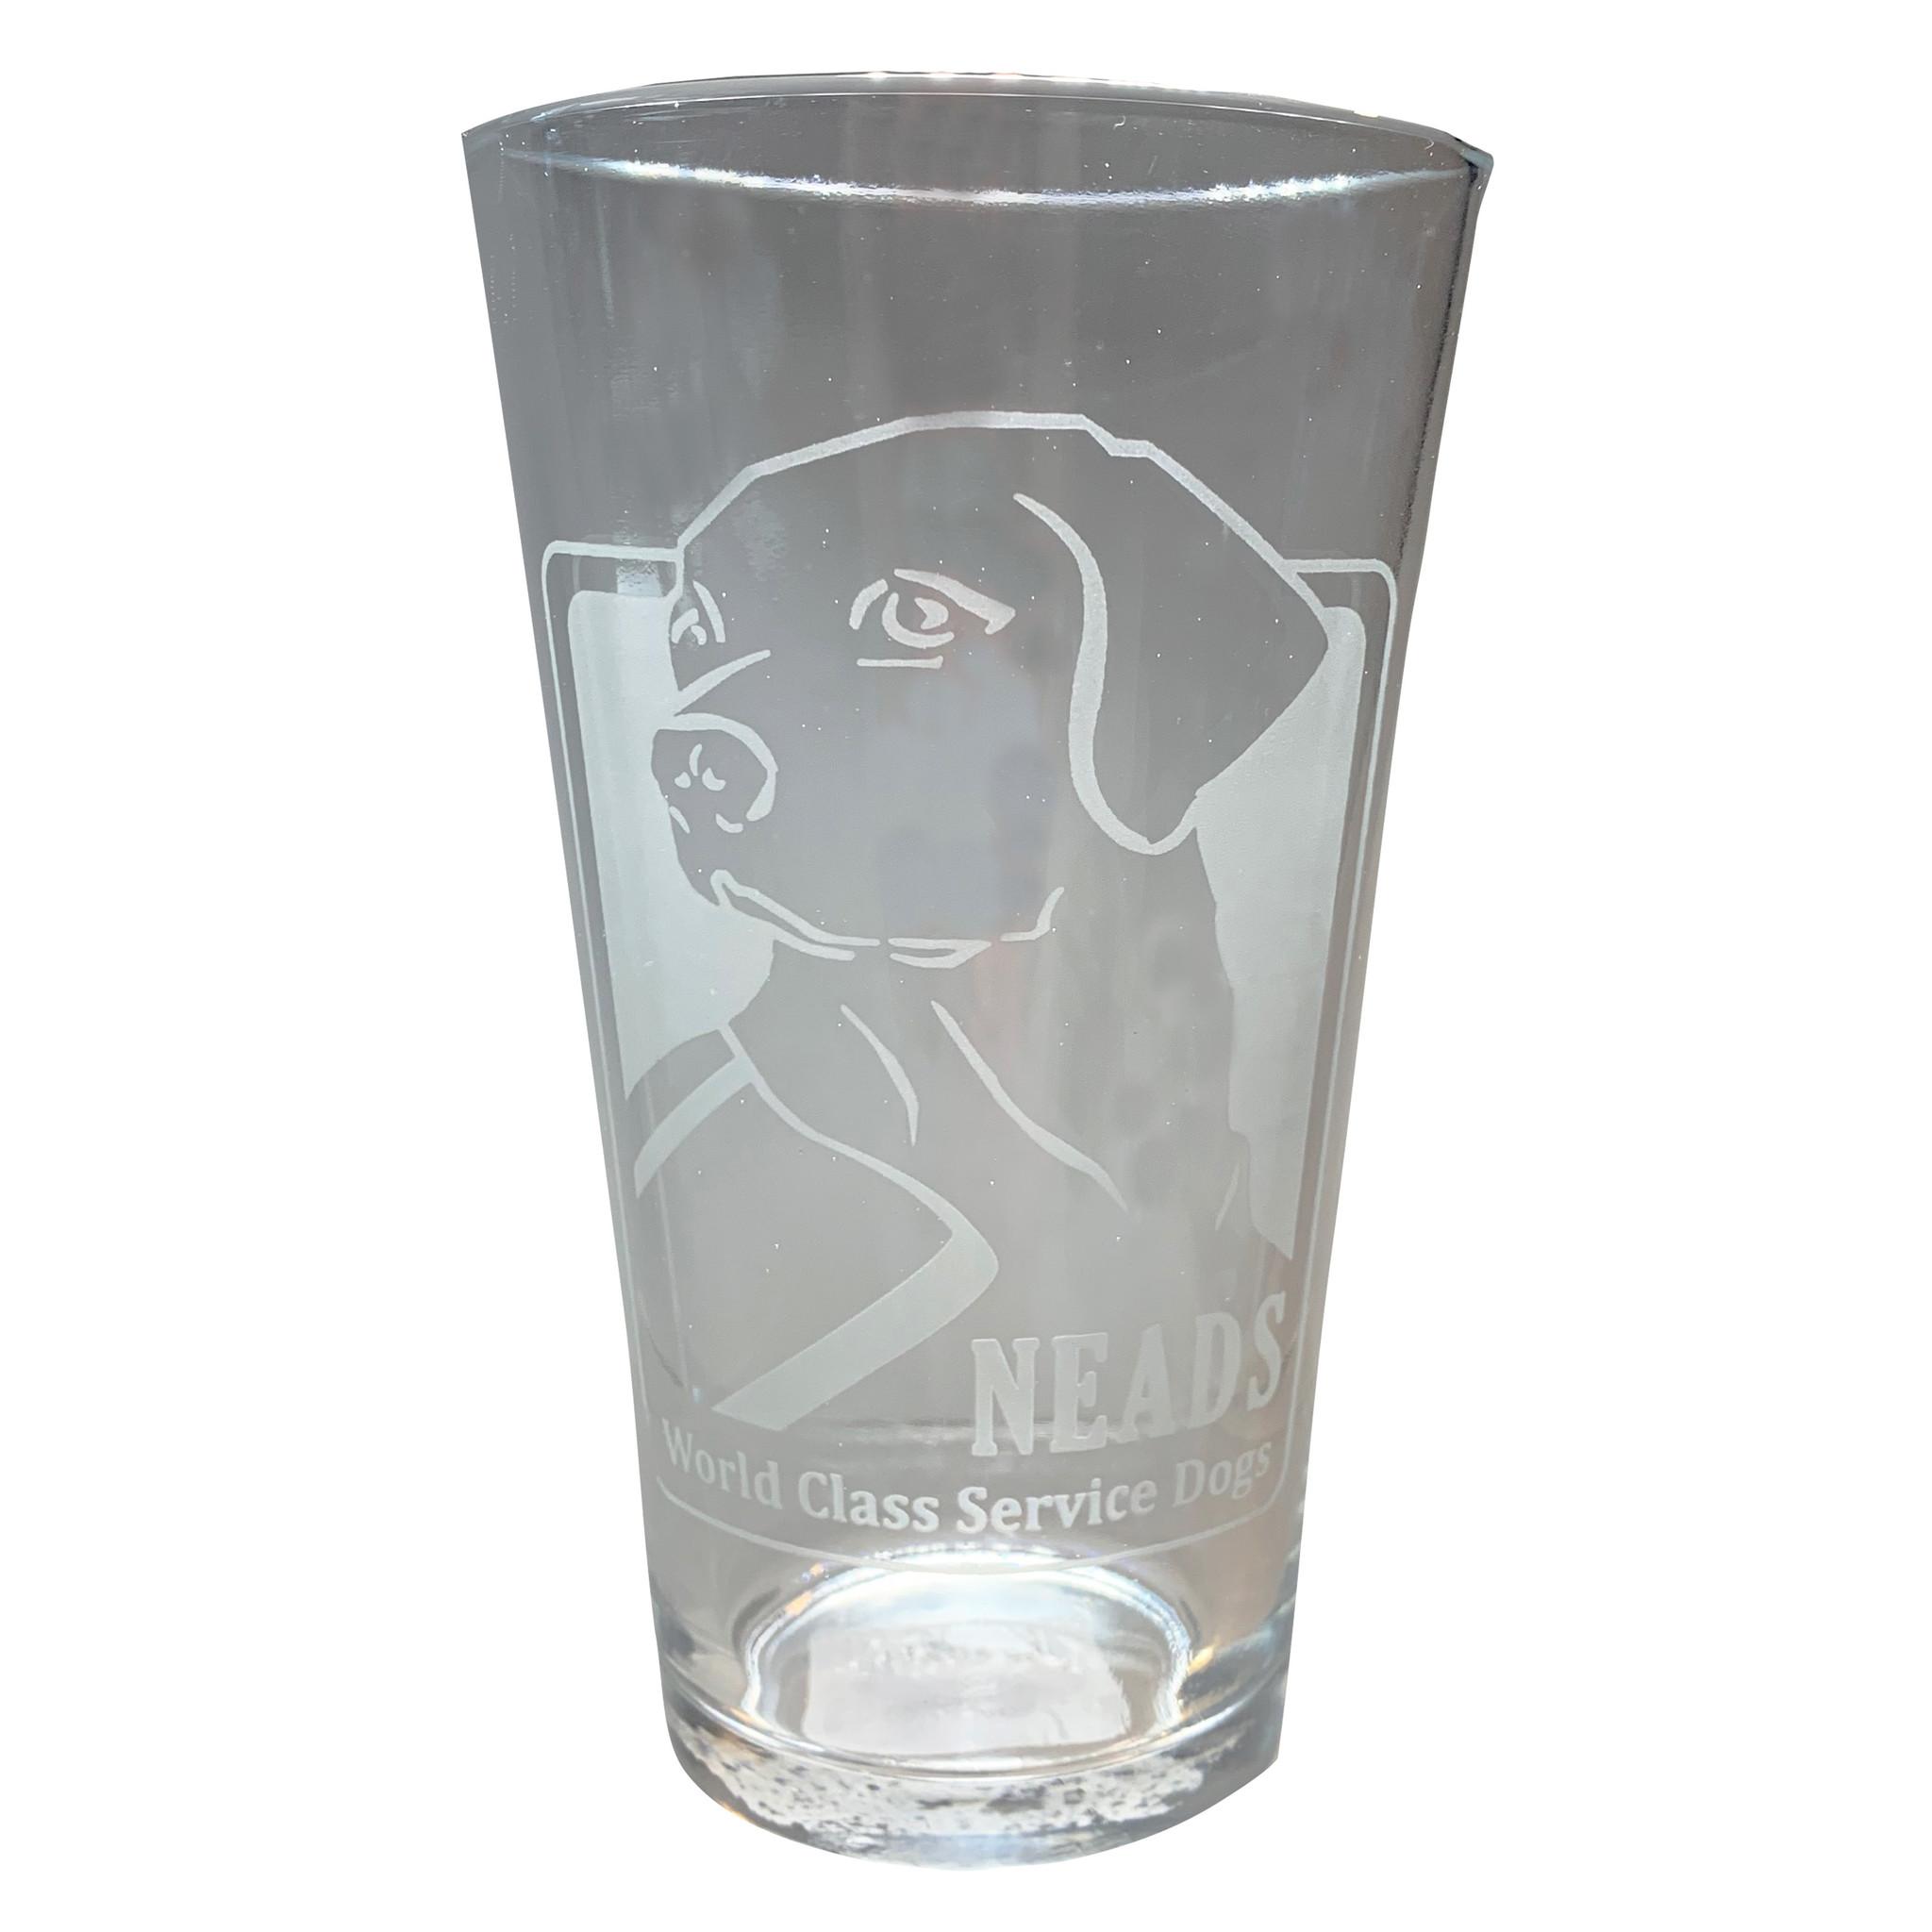 NEADS Pint Glass